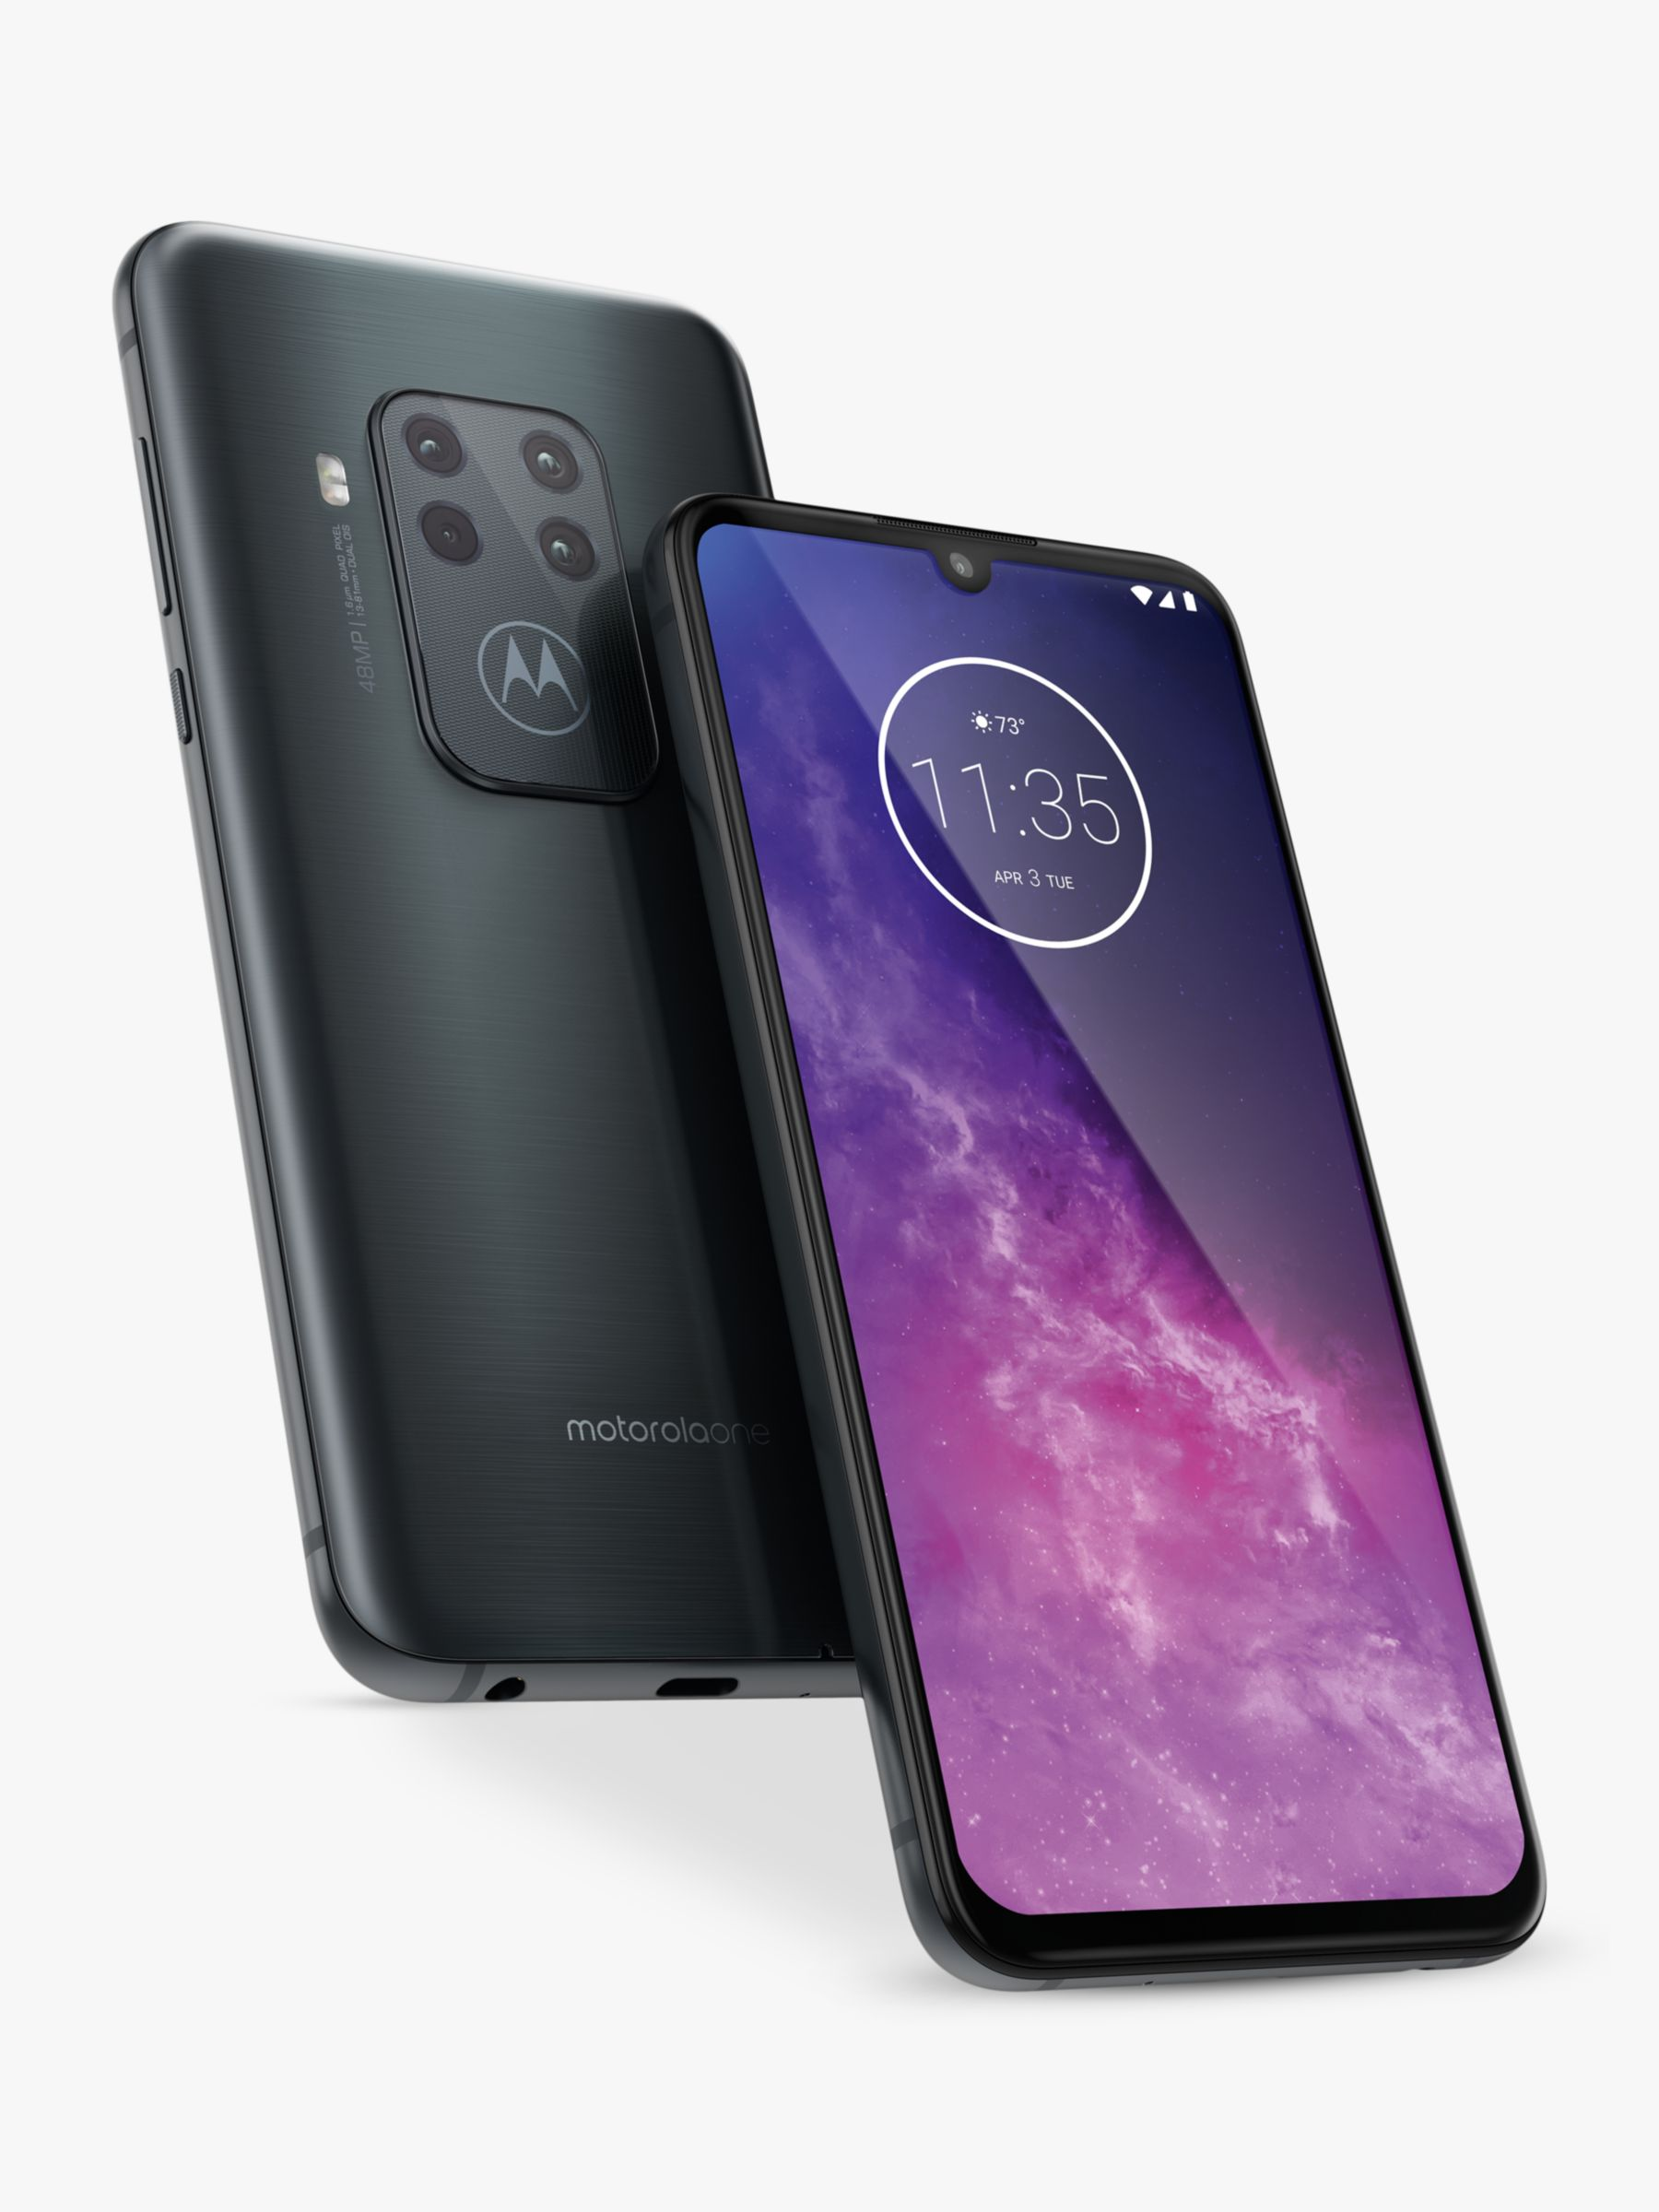 "Motorola Motorola One Zoom SIM Free Smartphone, Android, 6.4"", 4G LTE, SIM Free, 4GB RAM, 128GB, Electric Grey"